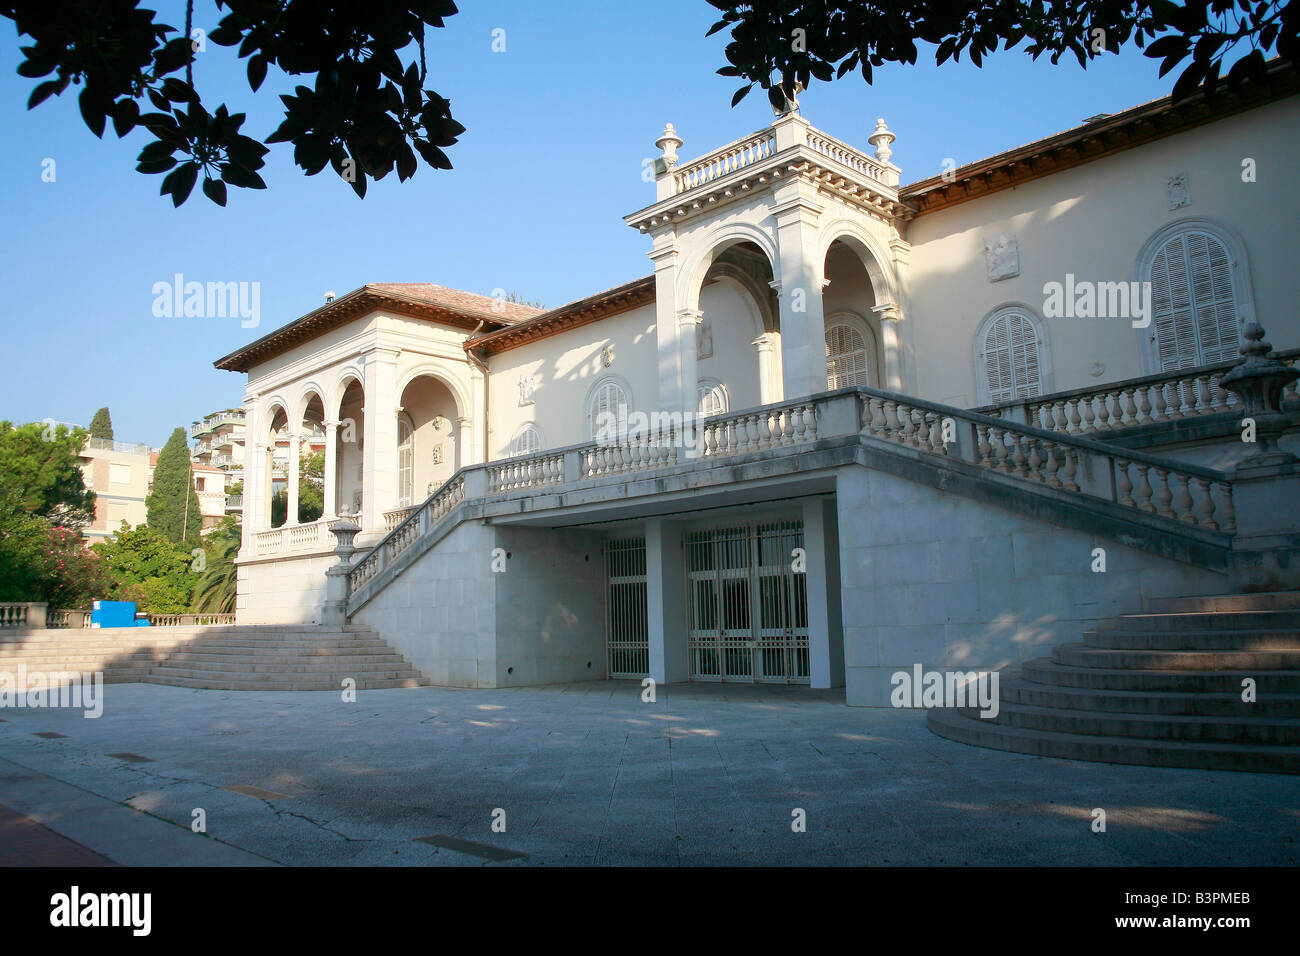 Fa�ade, Villa Ormond, Sanremo, Ligury, Italy - Stock Image